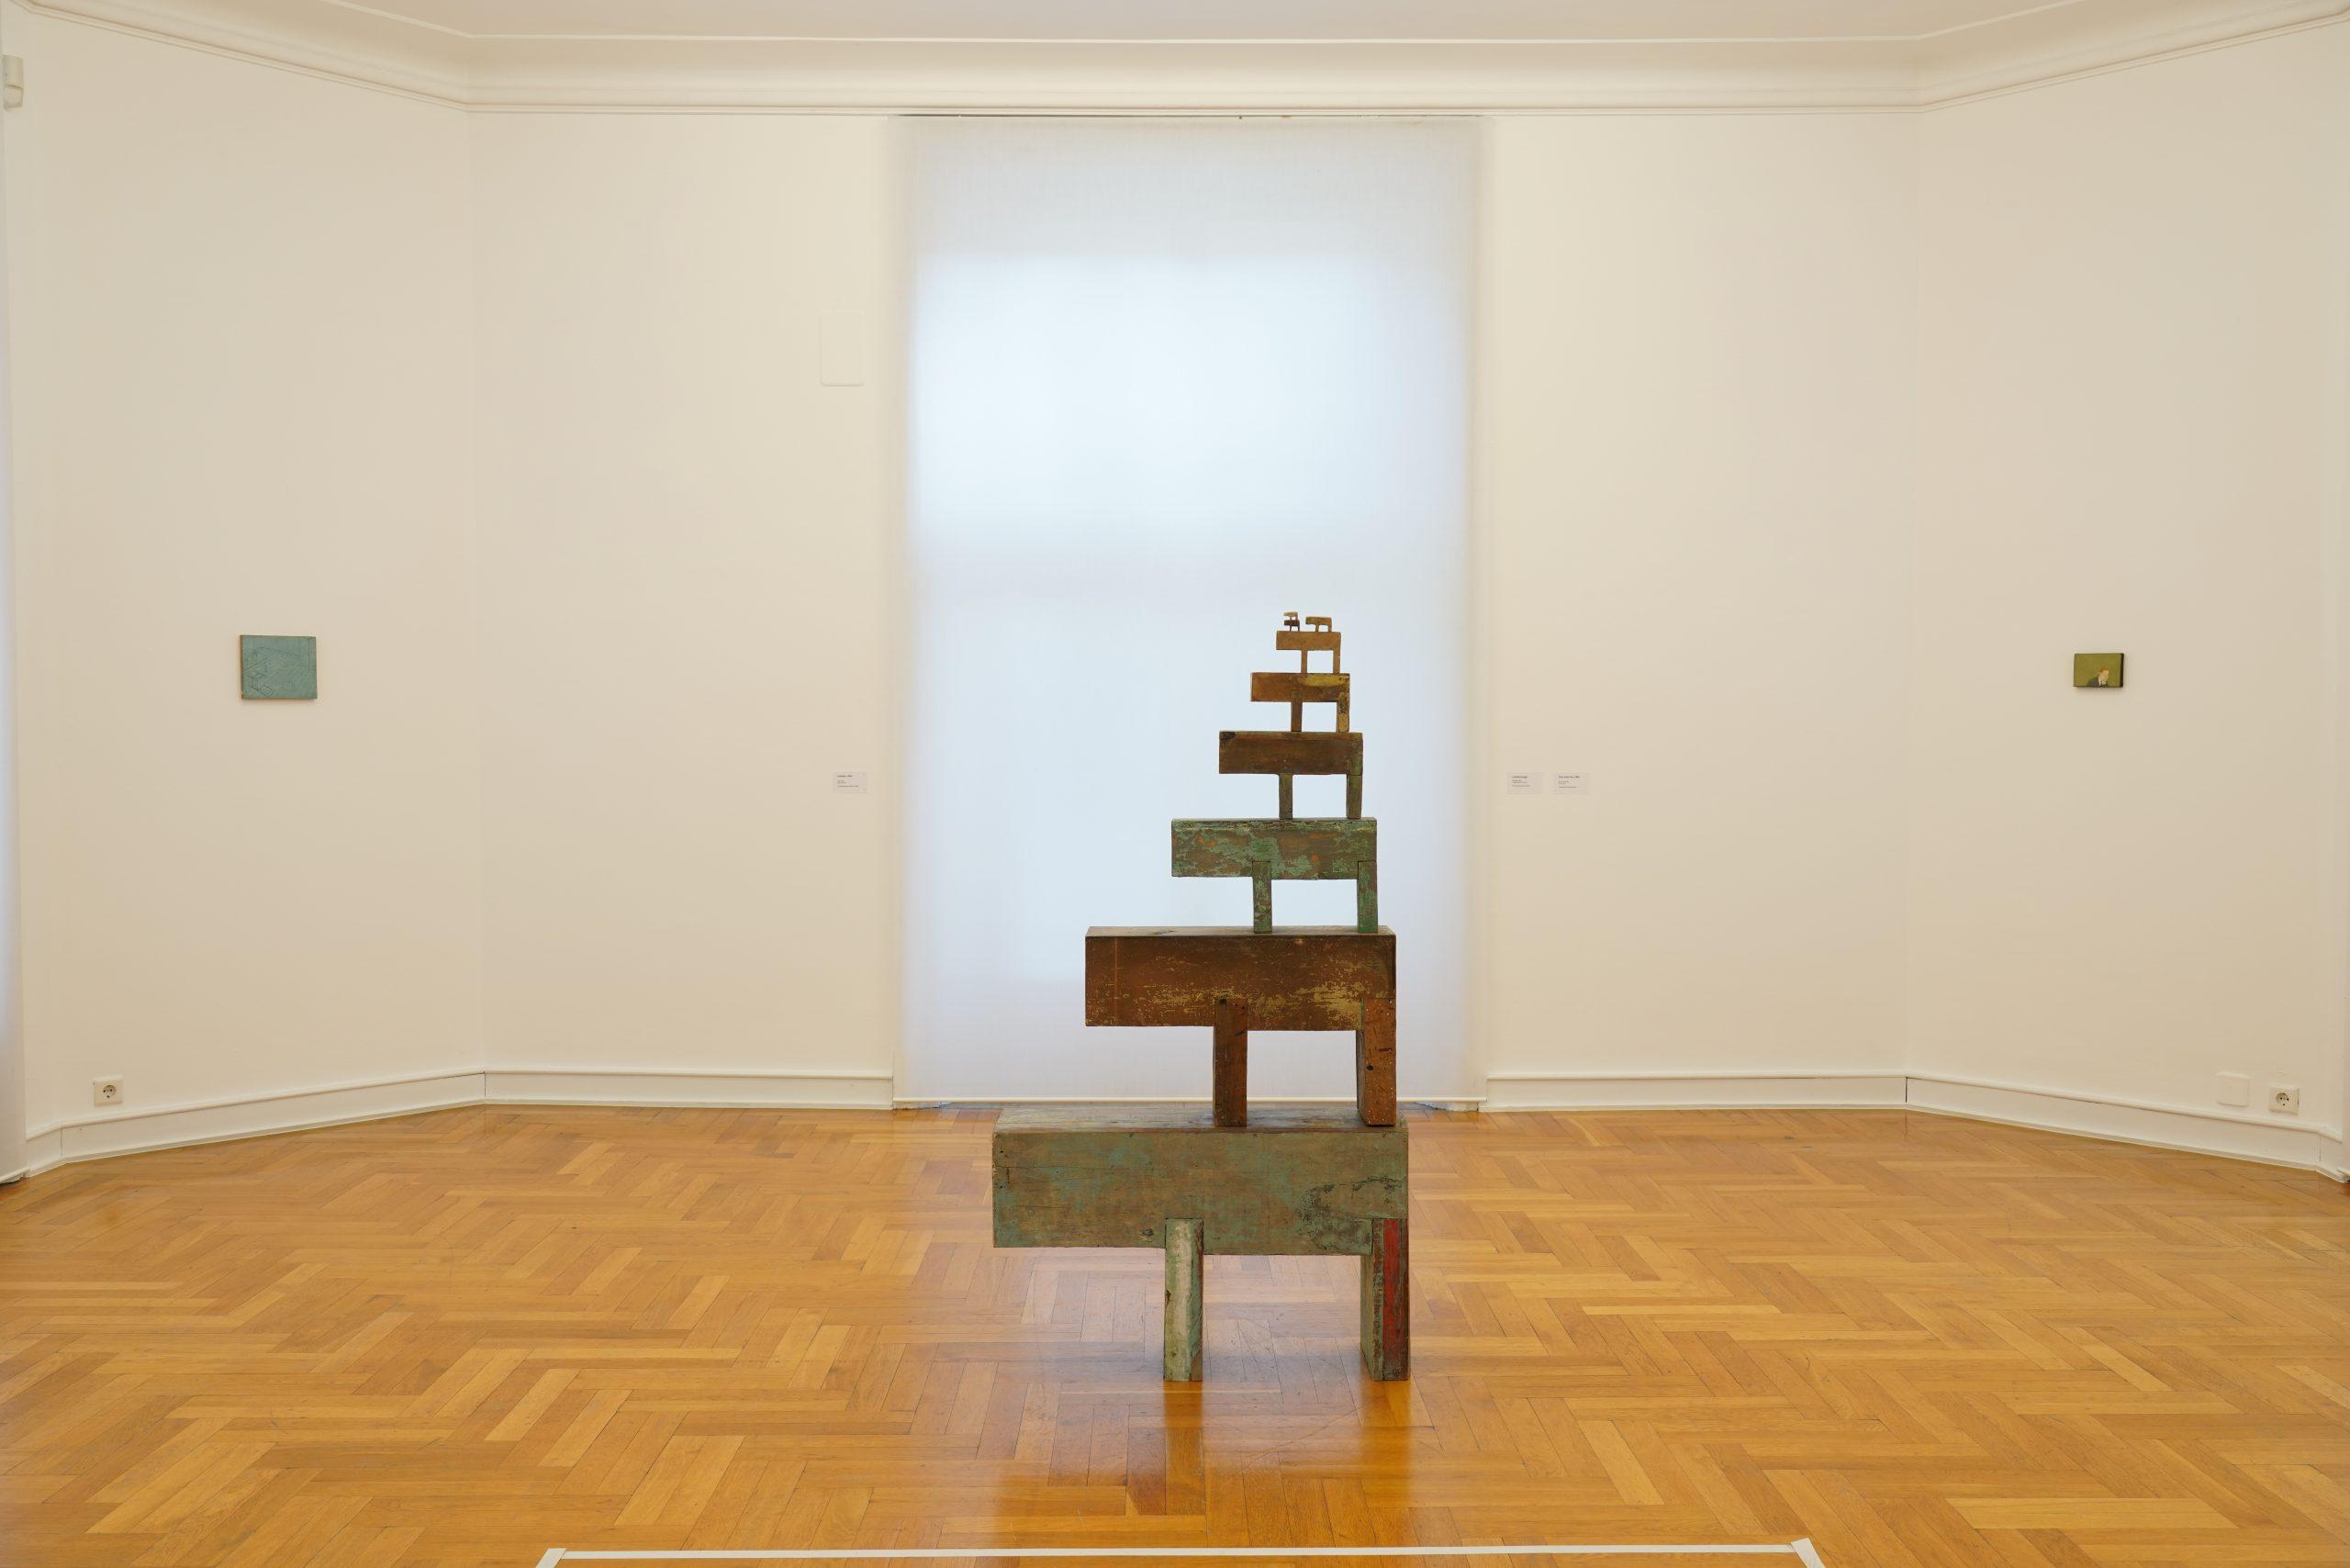 Francis Alys, installation view Leverkusen, 2019